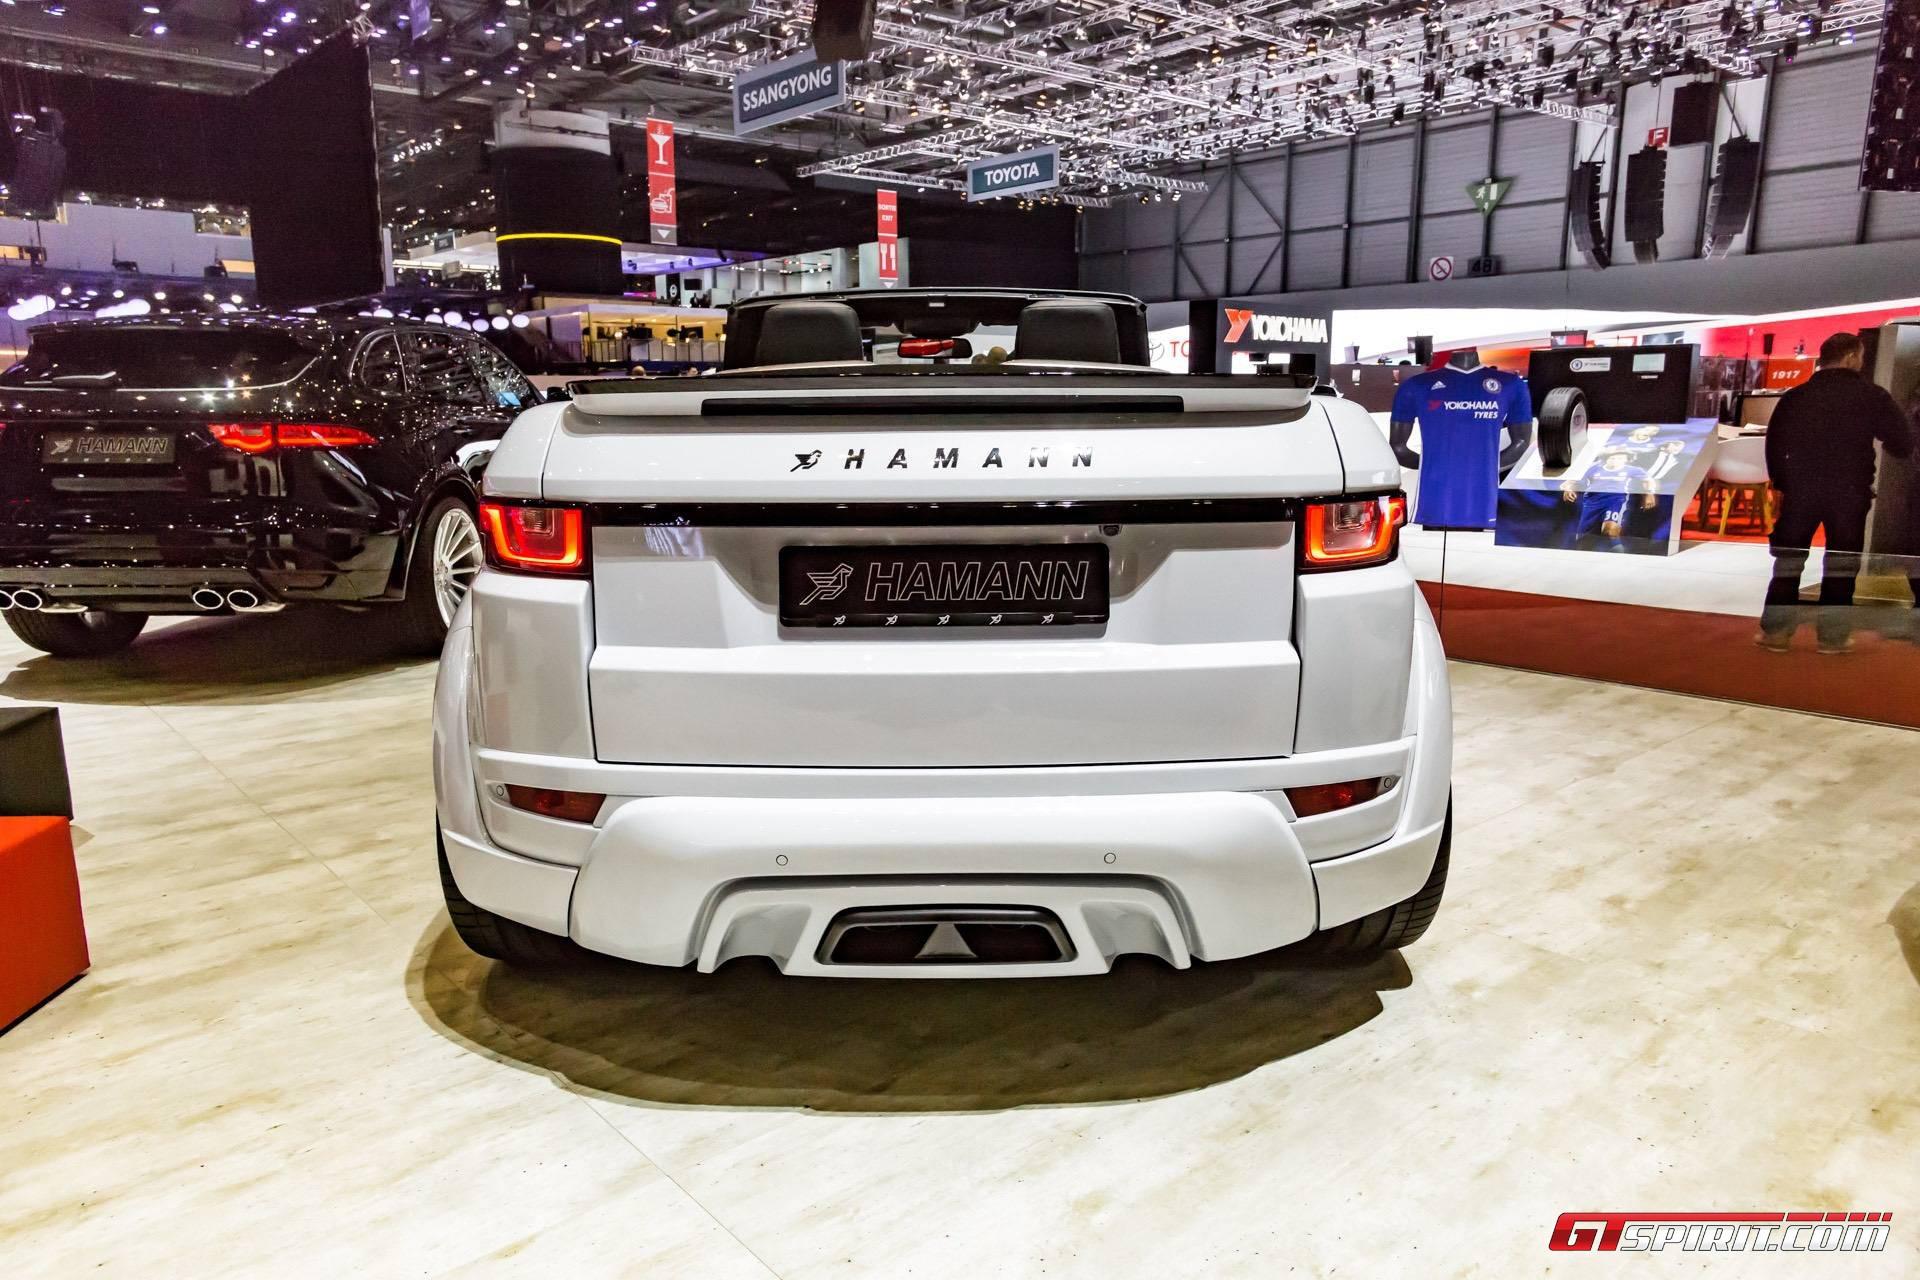 Geneva 2017 Hamann Range Rover Evoque Convertible GTspirit